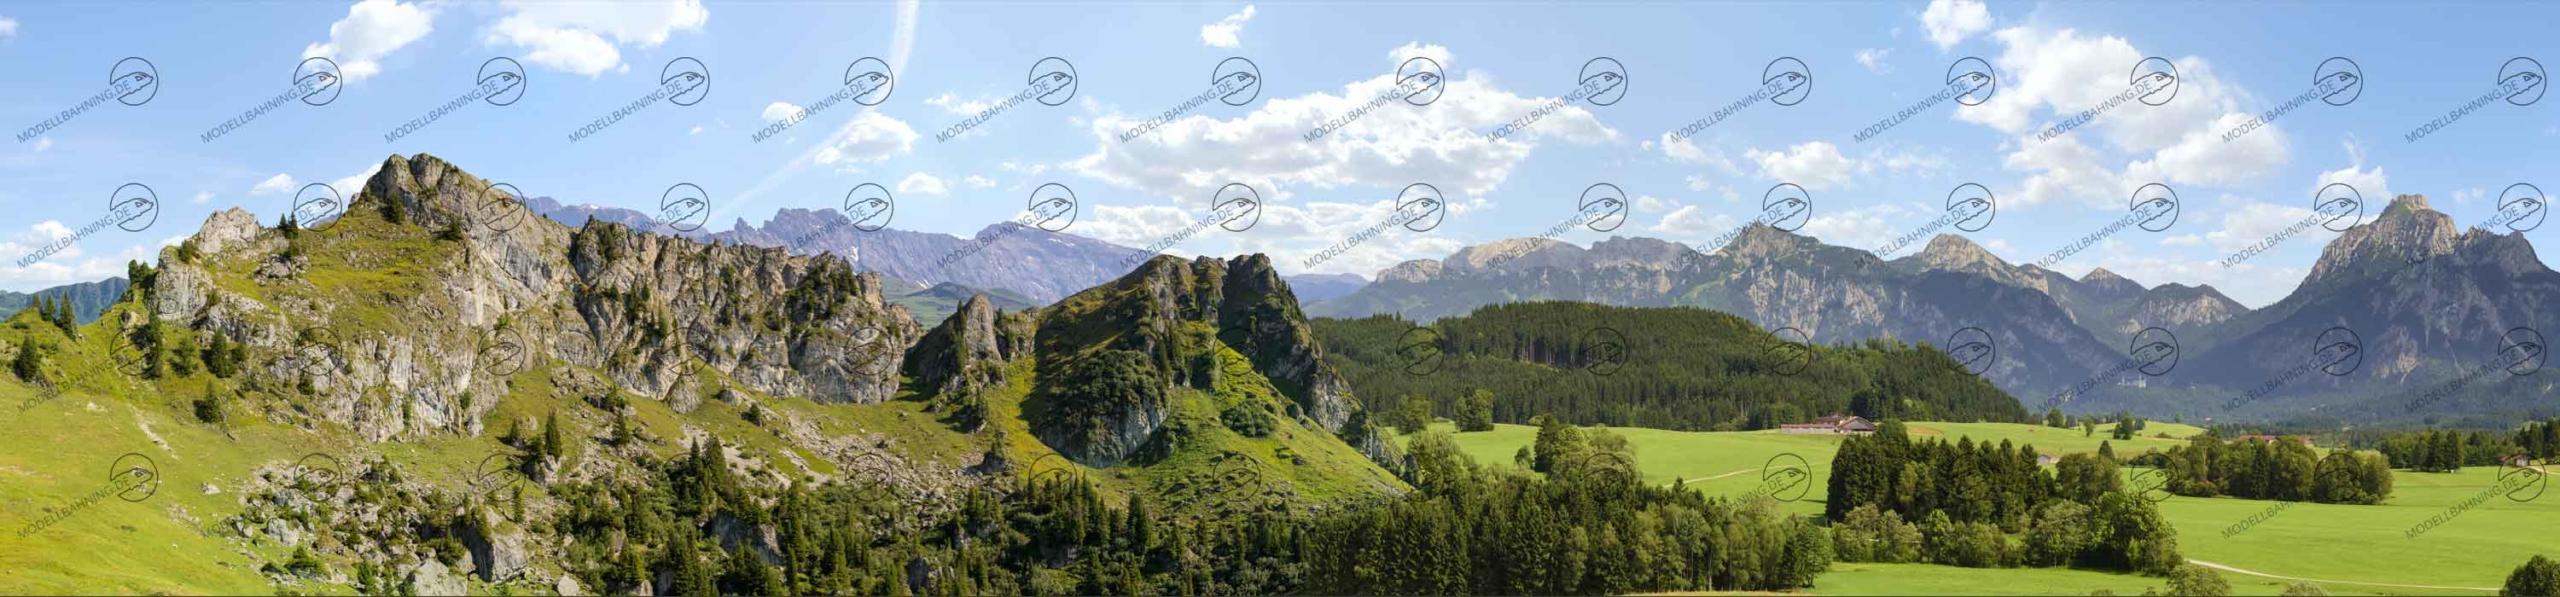 "Allgäu Teil 1 ""Felswand"" – Modellbahn Hintergrund 300cm x 50 cm 1"